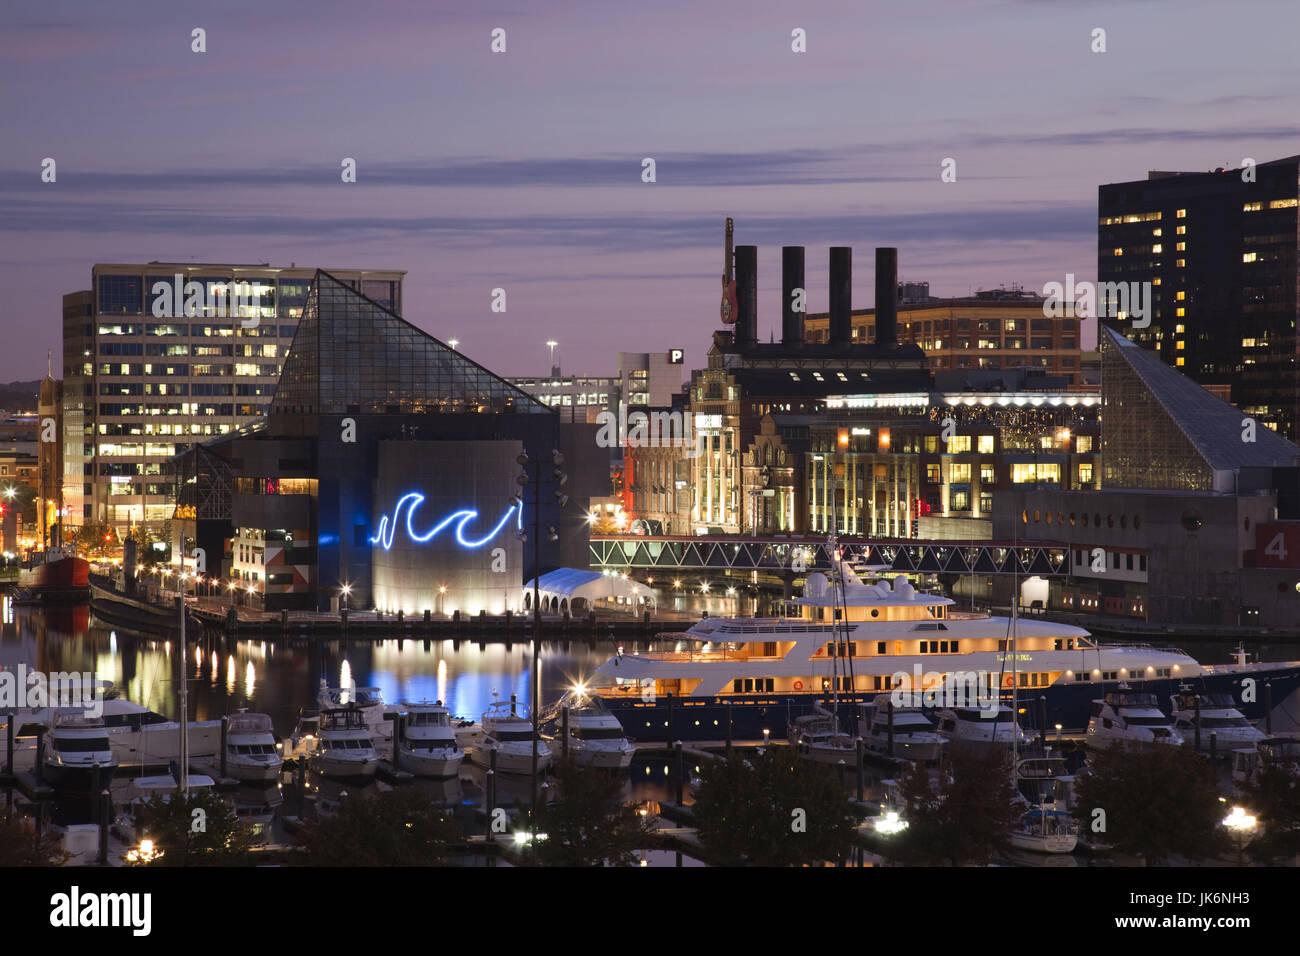 USA, Maryland, Baltimore, Inner Harbor, National Aquarium and Powerplant Mall, dawn - Stock Image